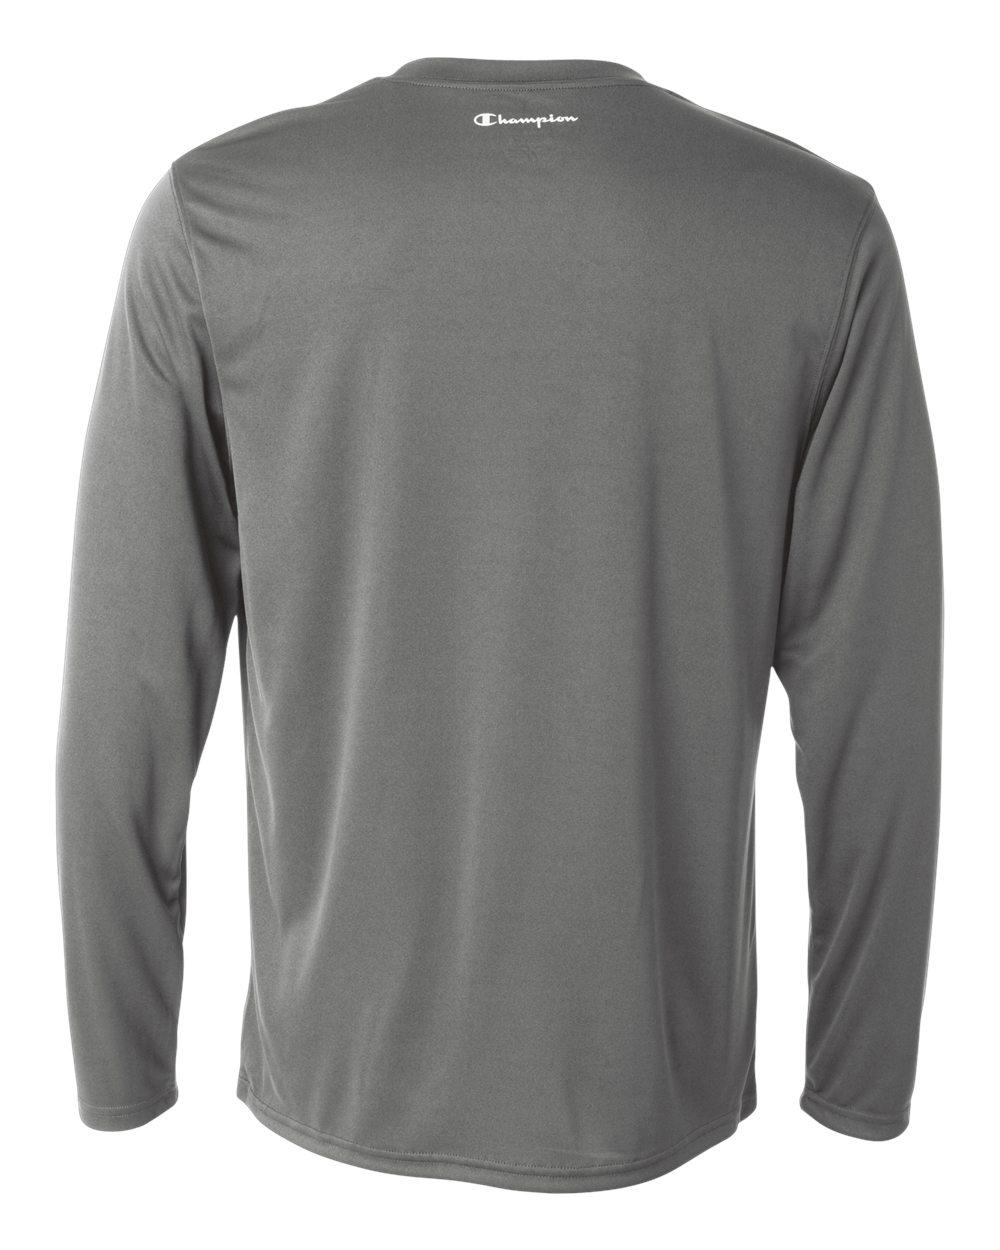 Champion-Men-039-s-Double-Dry-4-1-oz-Long-Sleeve-Interlock-T-Shirt-CW26-XS-3XL thumbnail 30